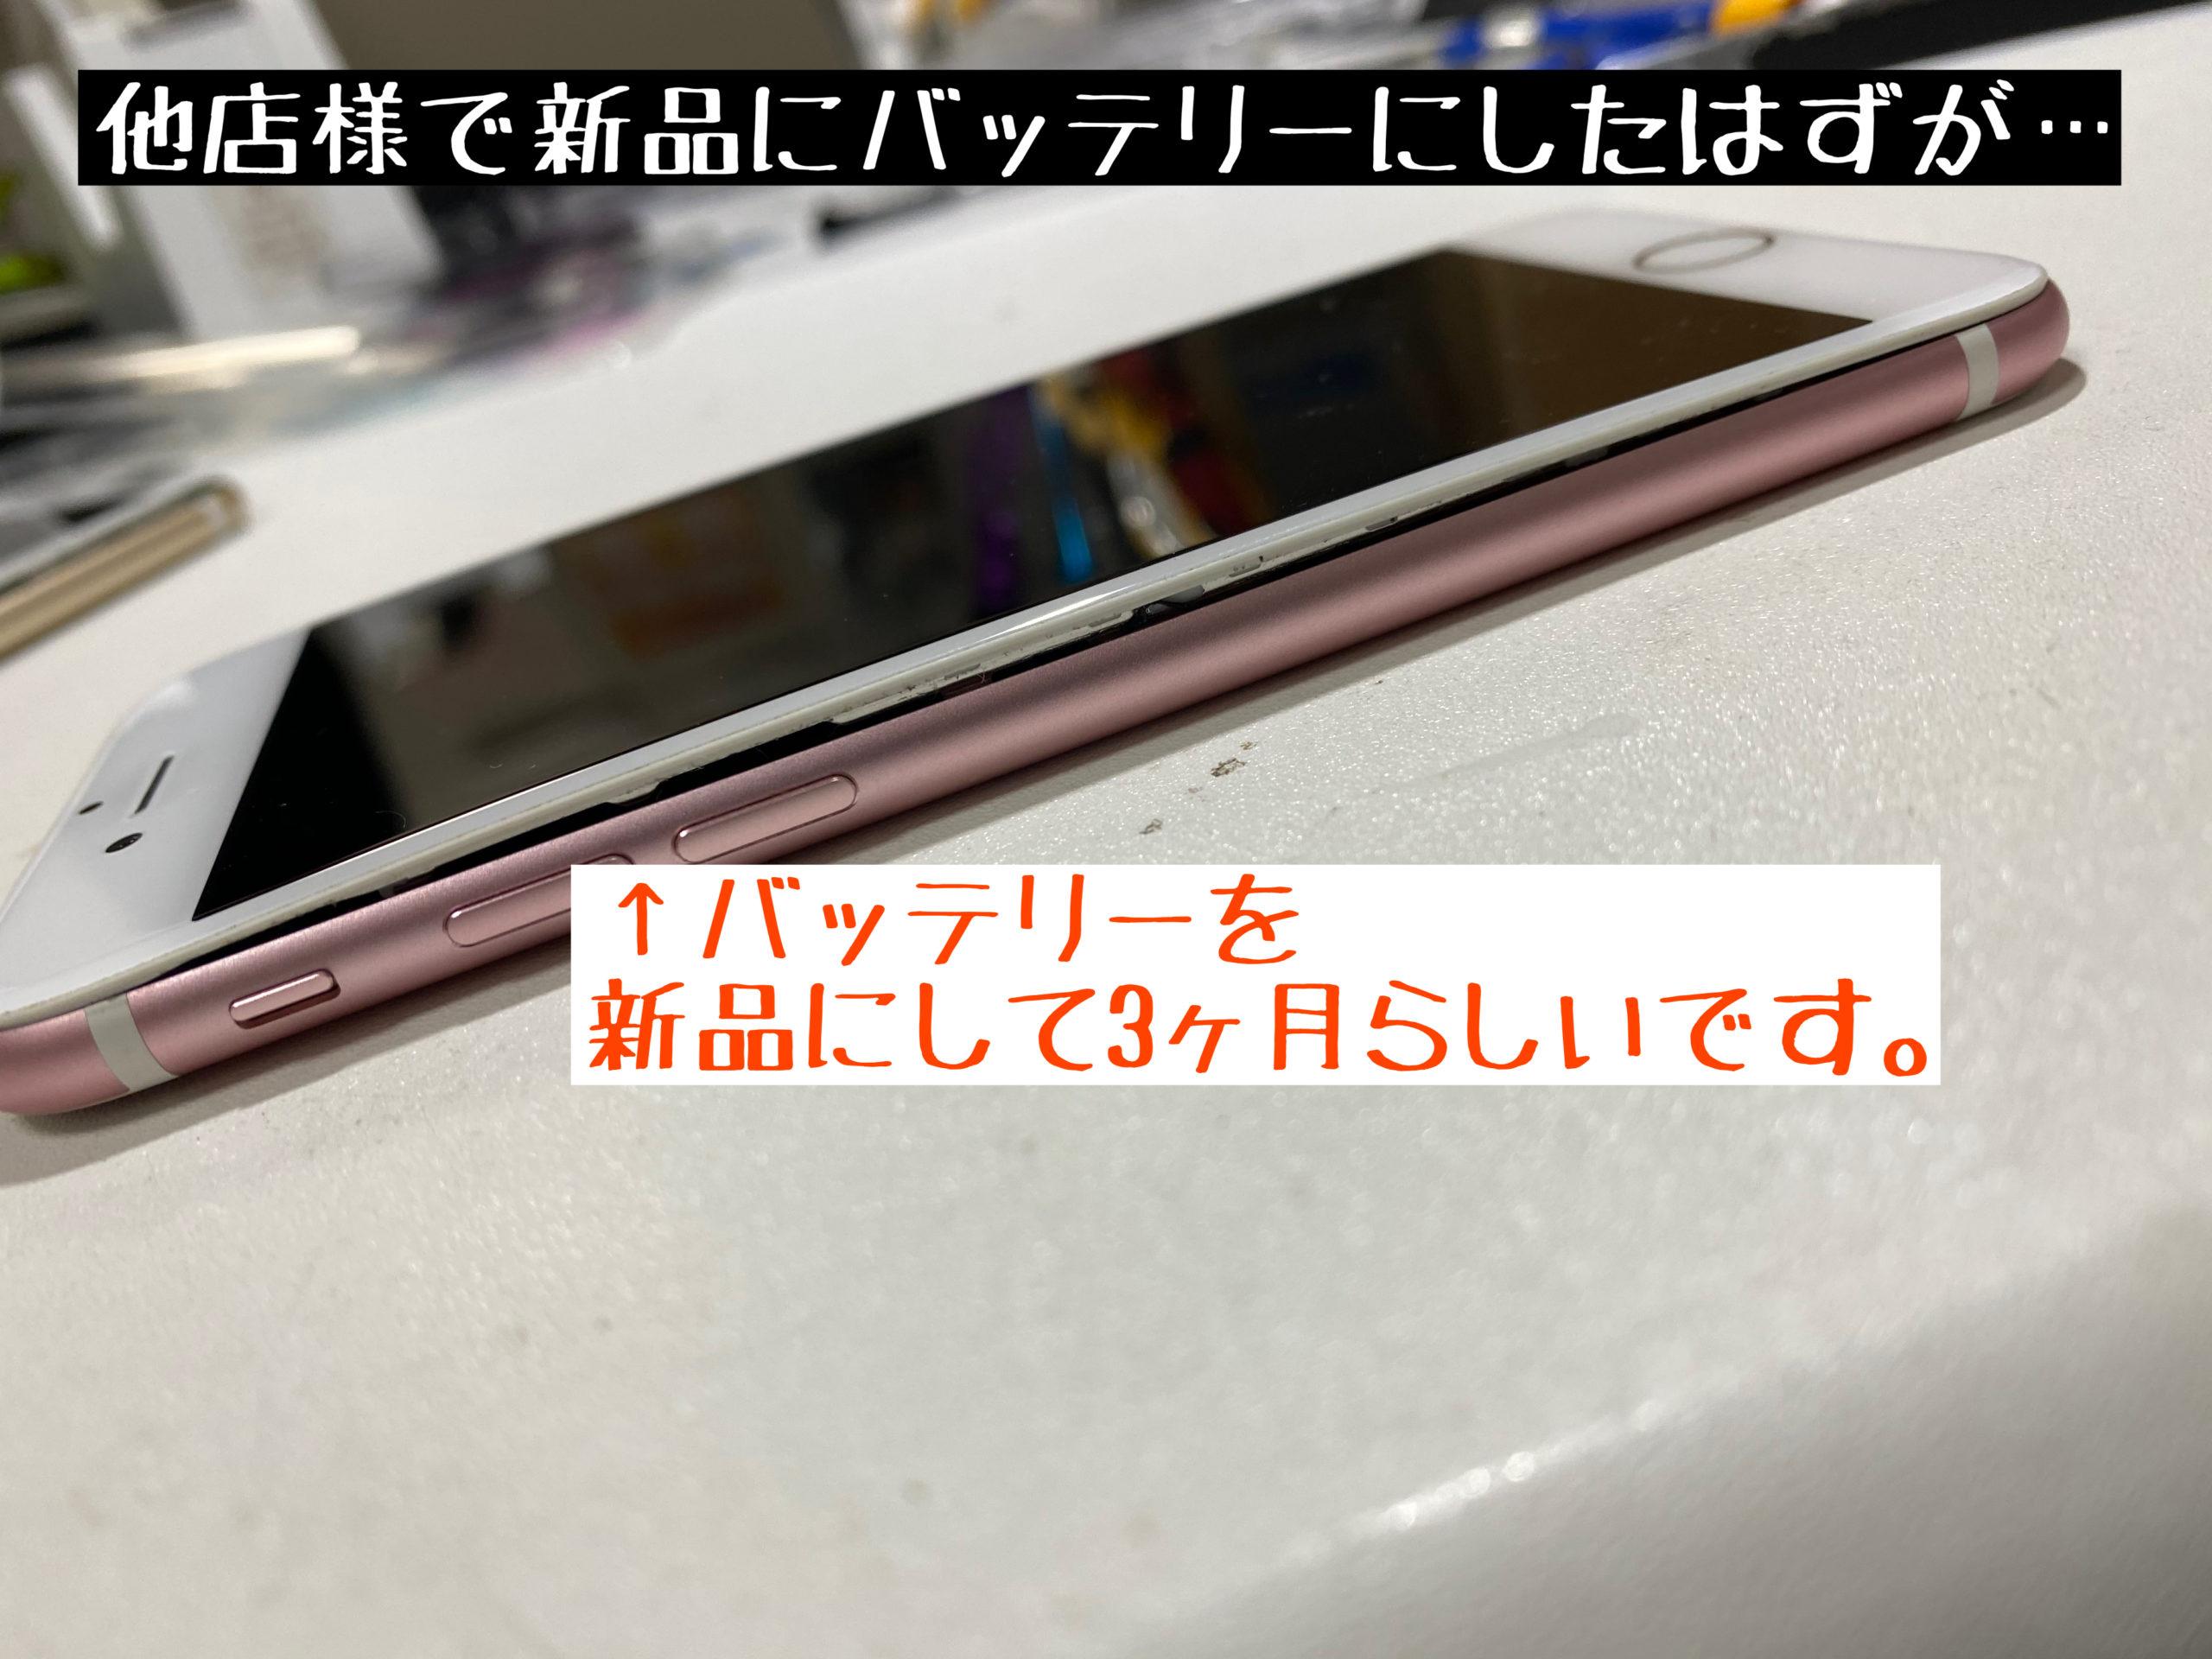 iPhone7 電池交換 バッテリー交換 アイフォン修理 江南 江南市 扶桑町 大口町 iPhone修理